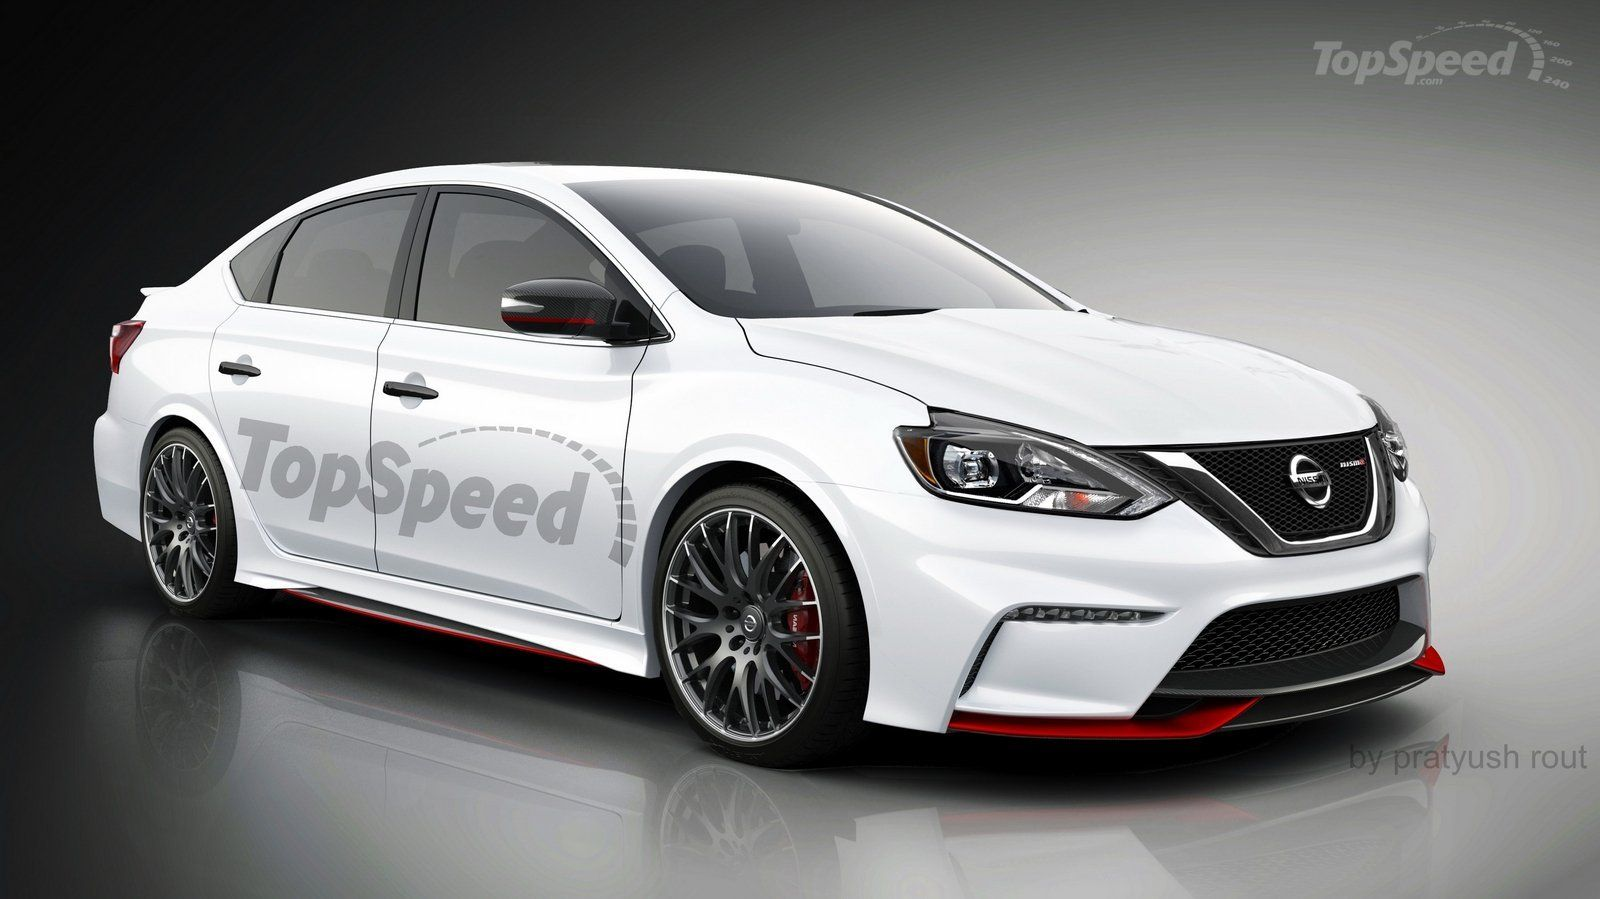 2017 Nissan Sentra Nismo Top Speed Nissan Sentra Nissan Almera Nissan